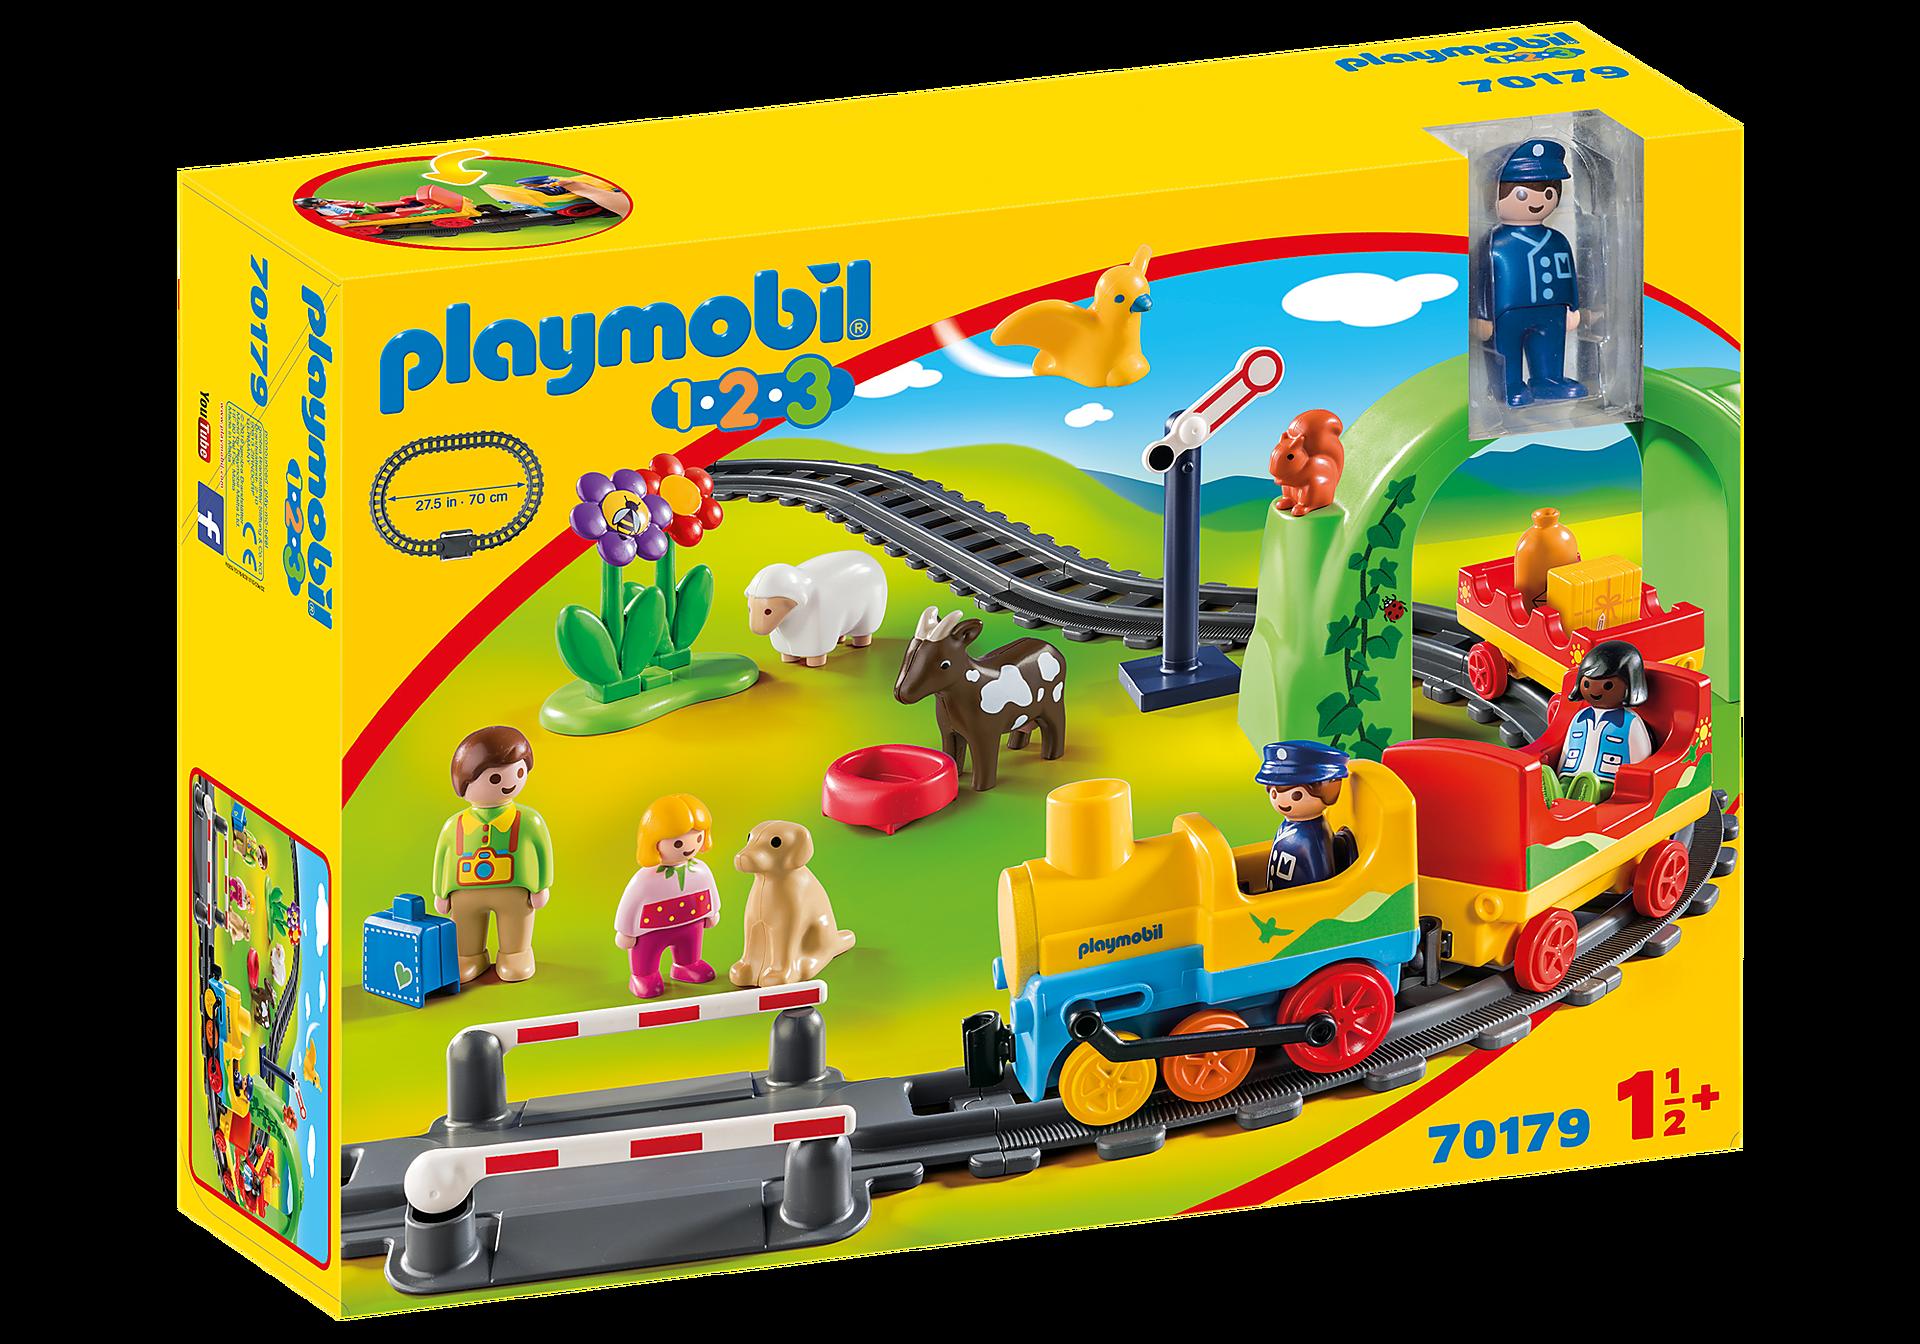 http://media.playmobil.com/i/playmobil/70179_product_box_front/My first train set